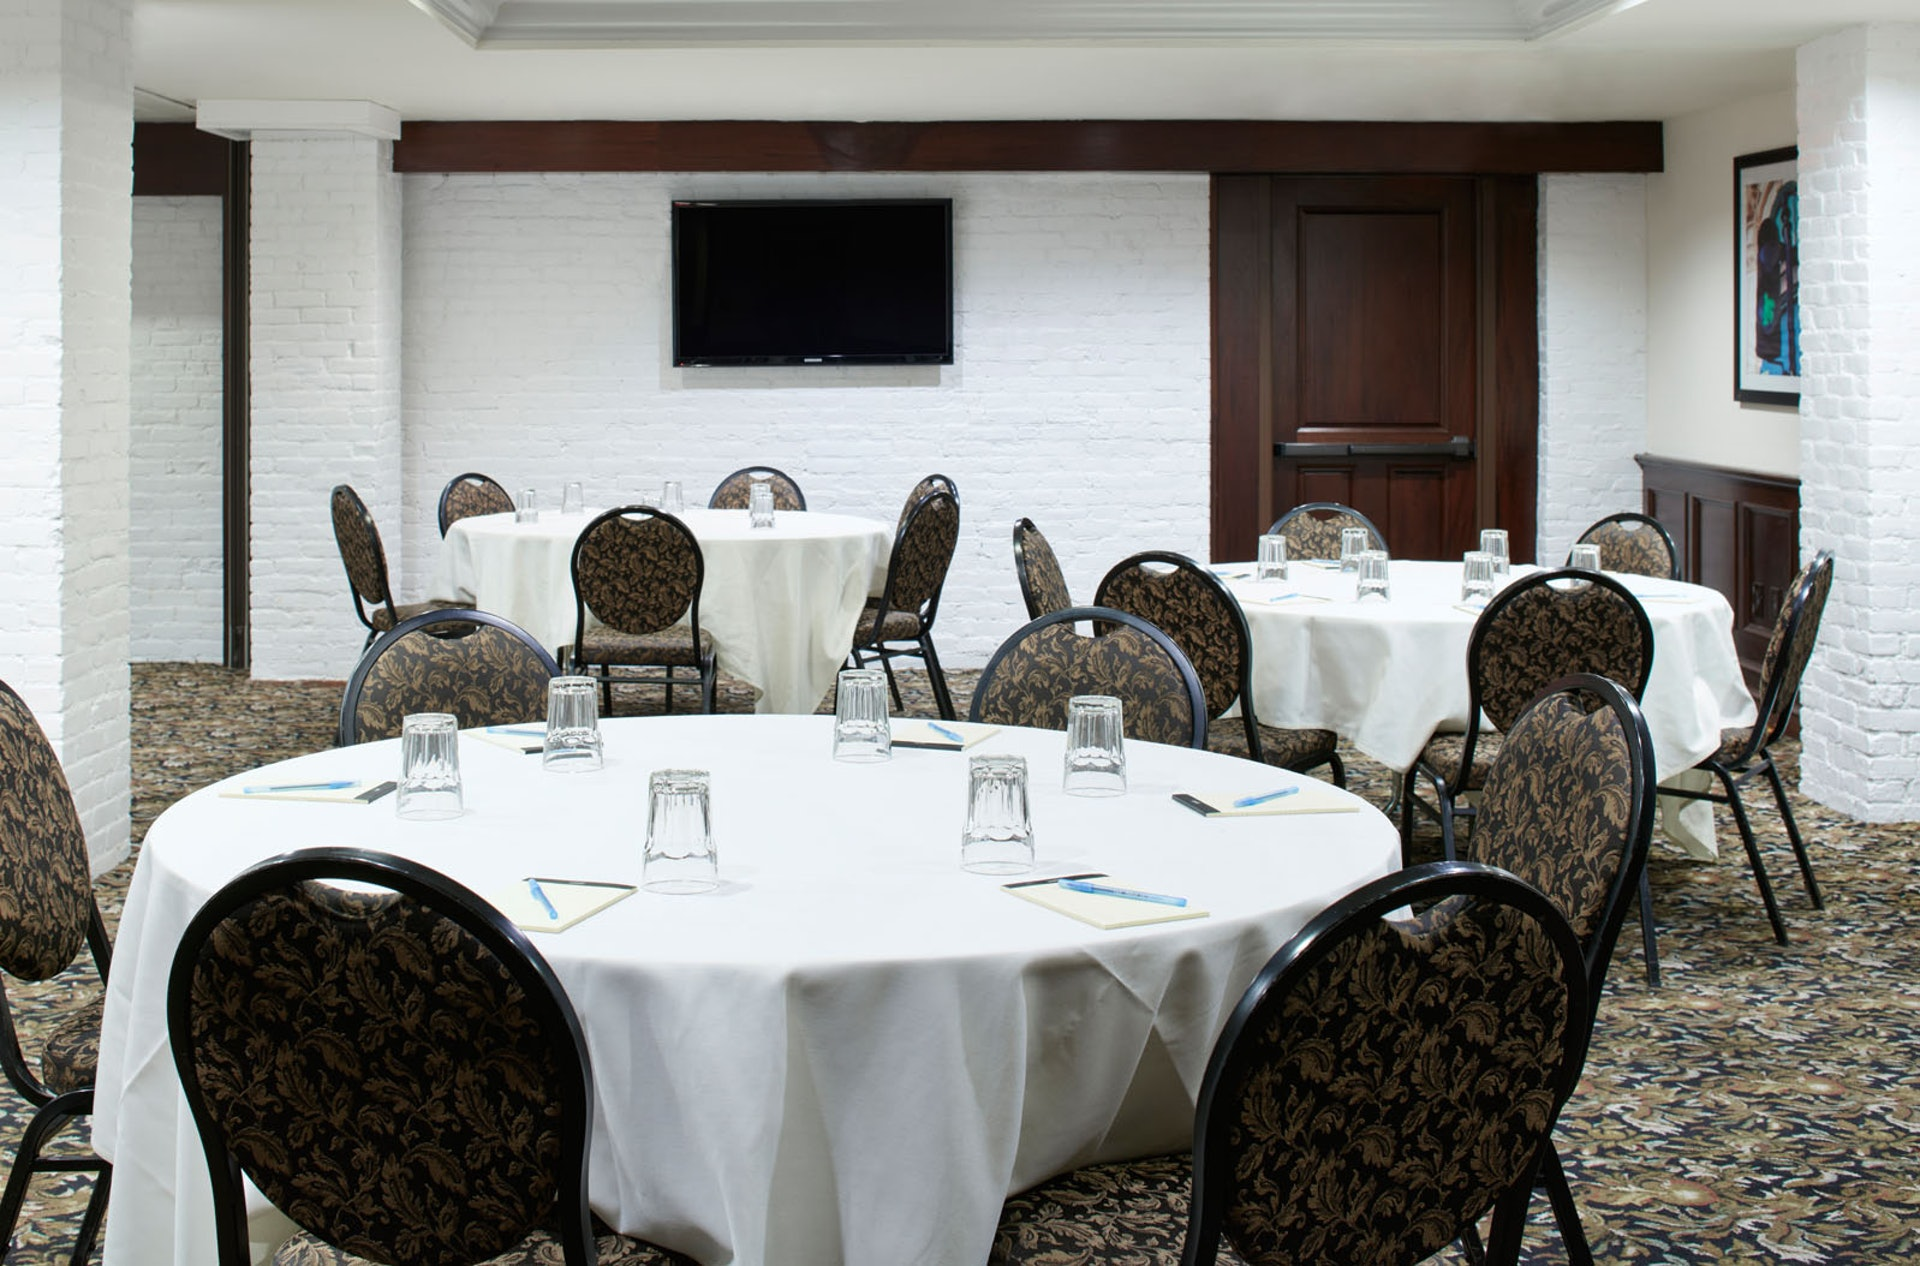 Meetings & Events Spaces